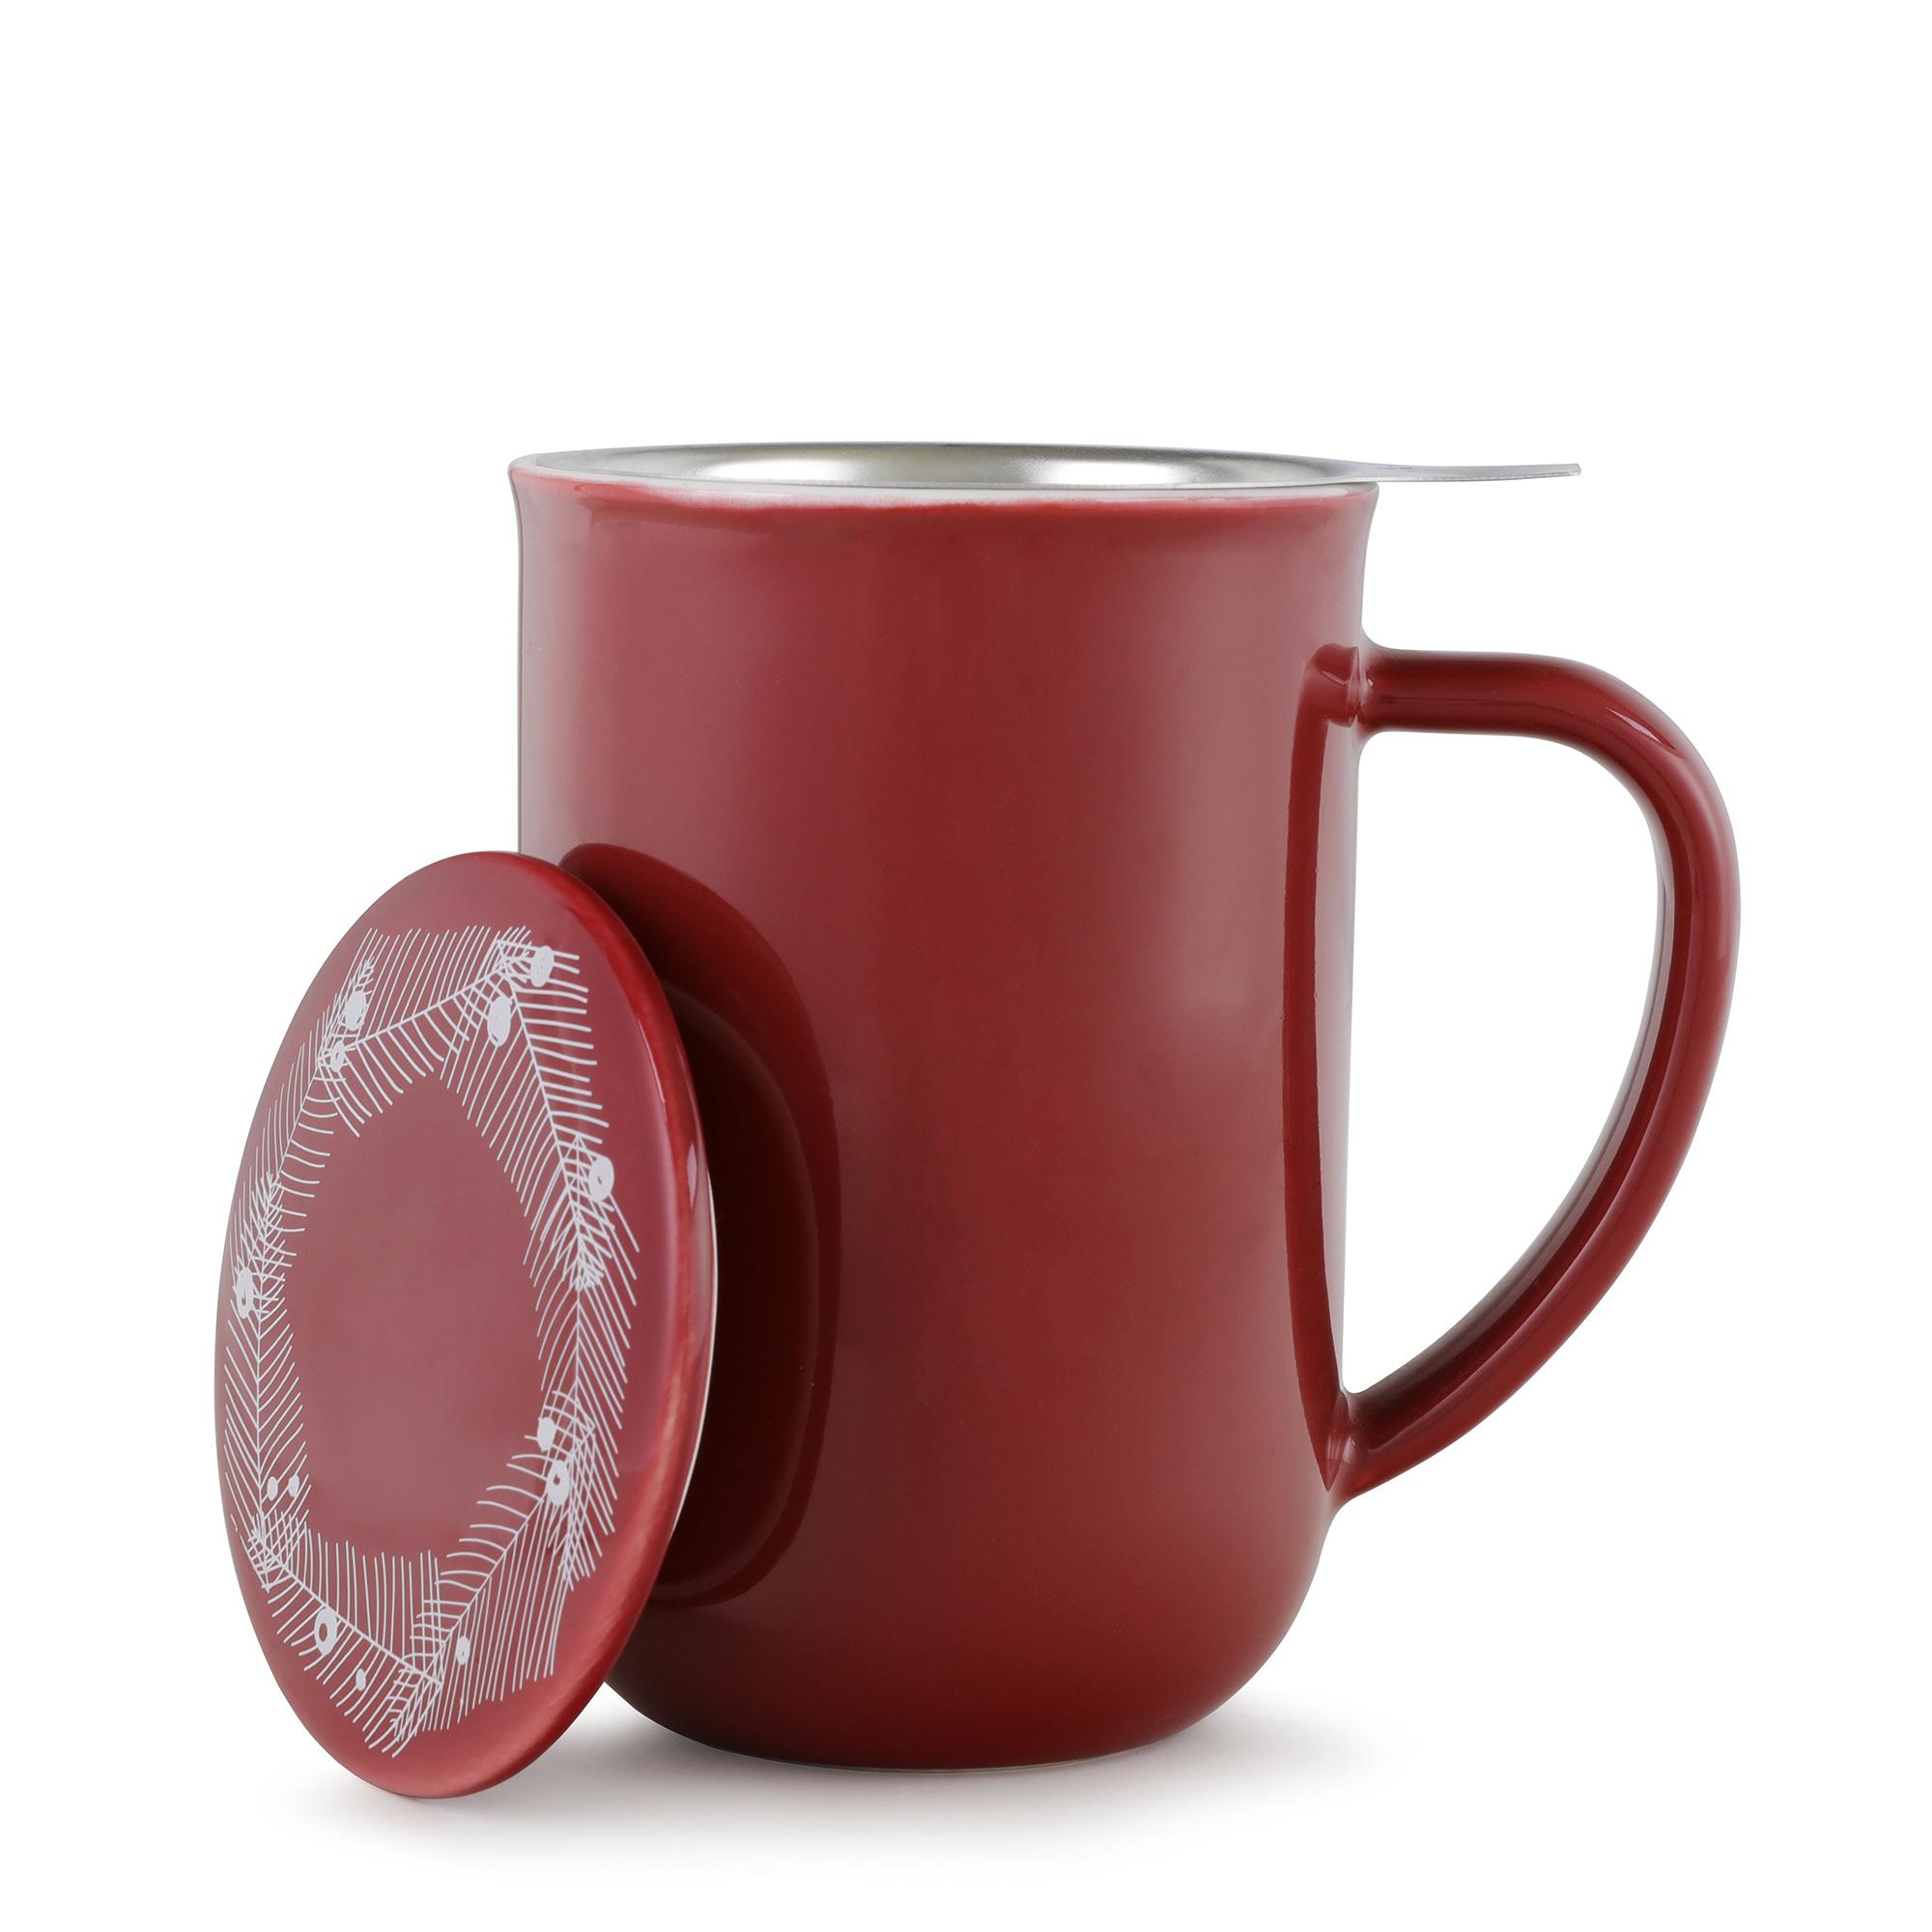 Minima™ Balanced winter tea mug red